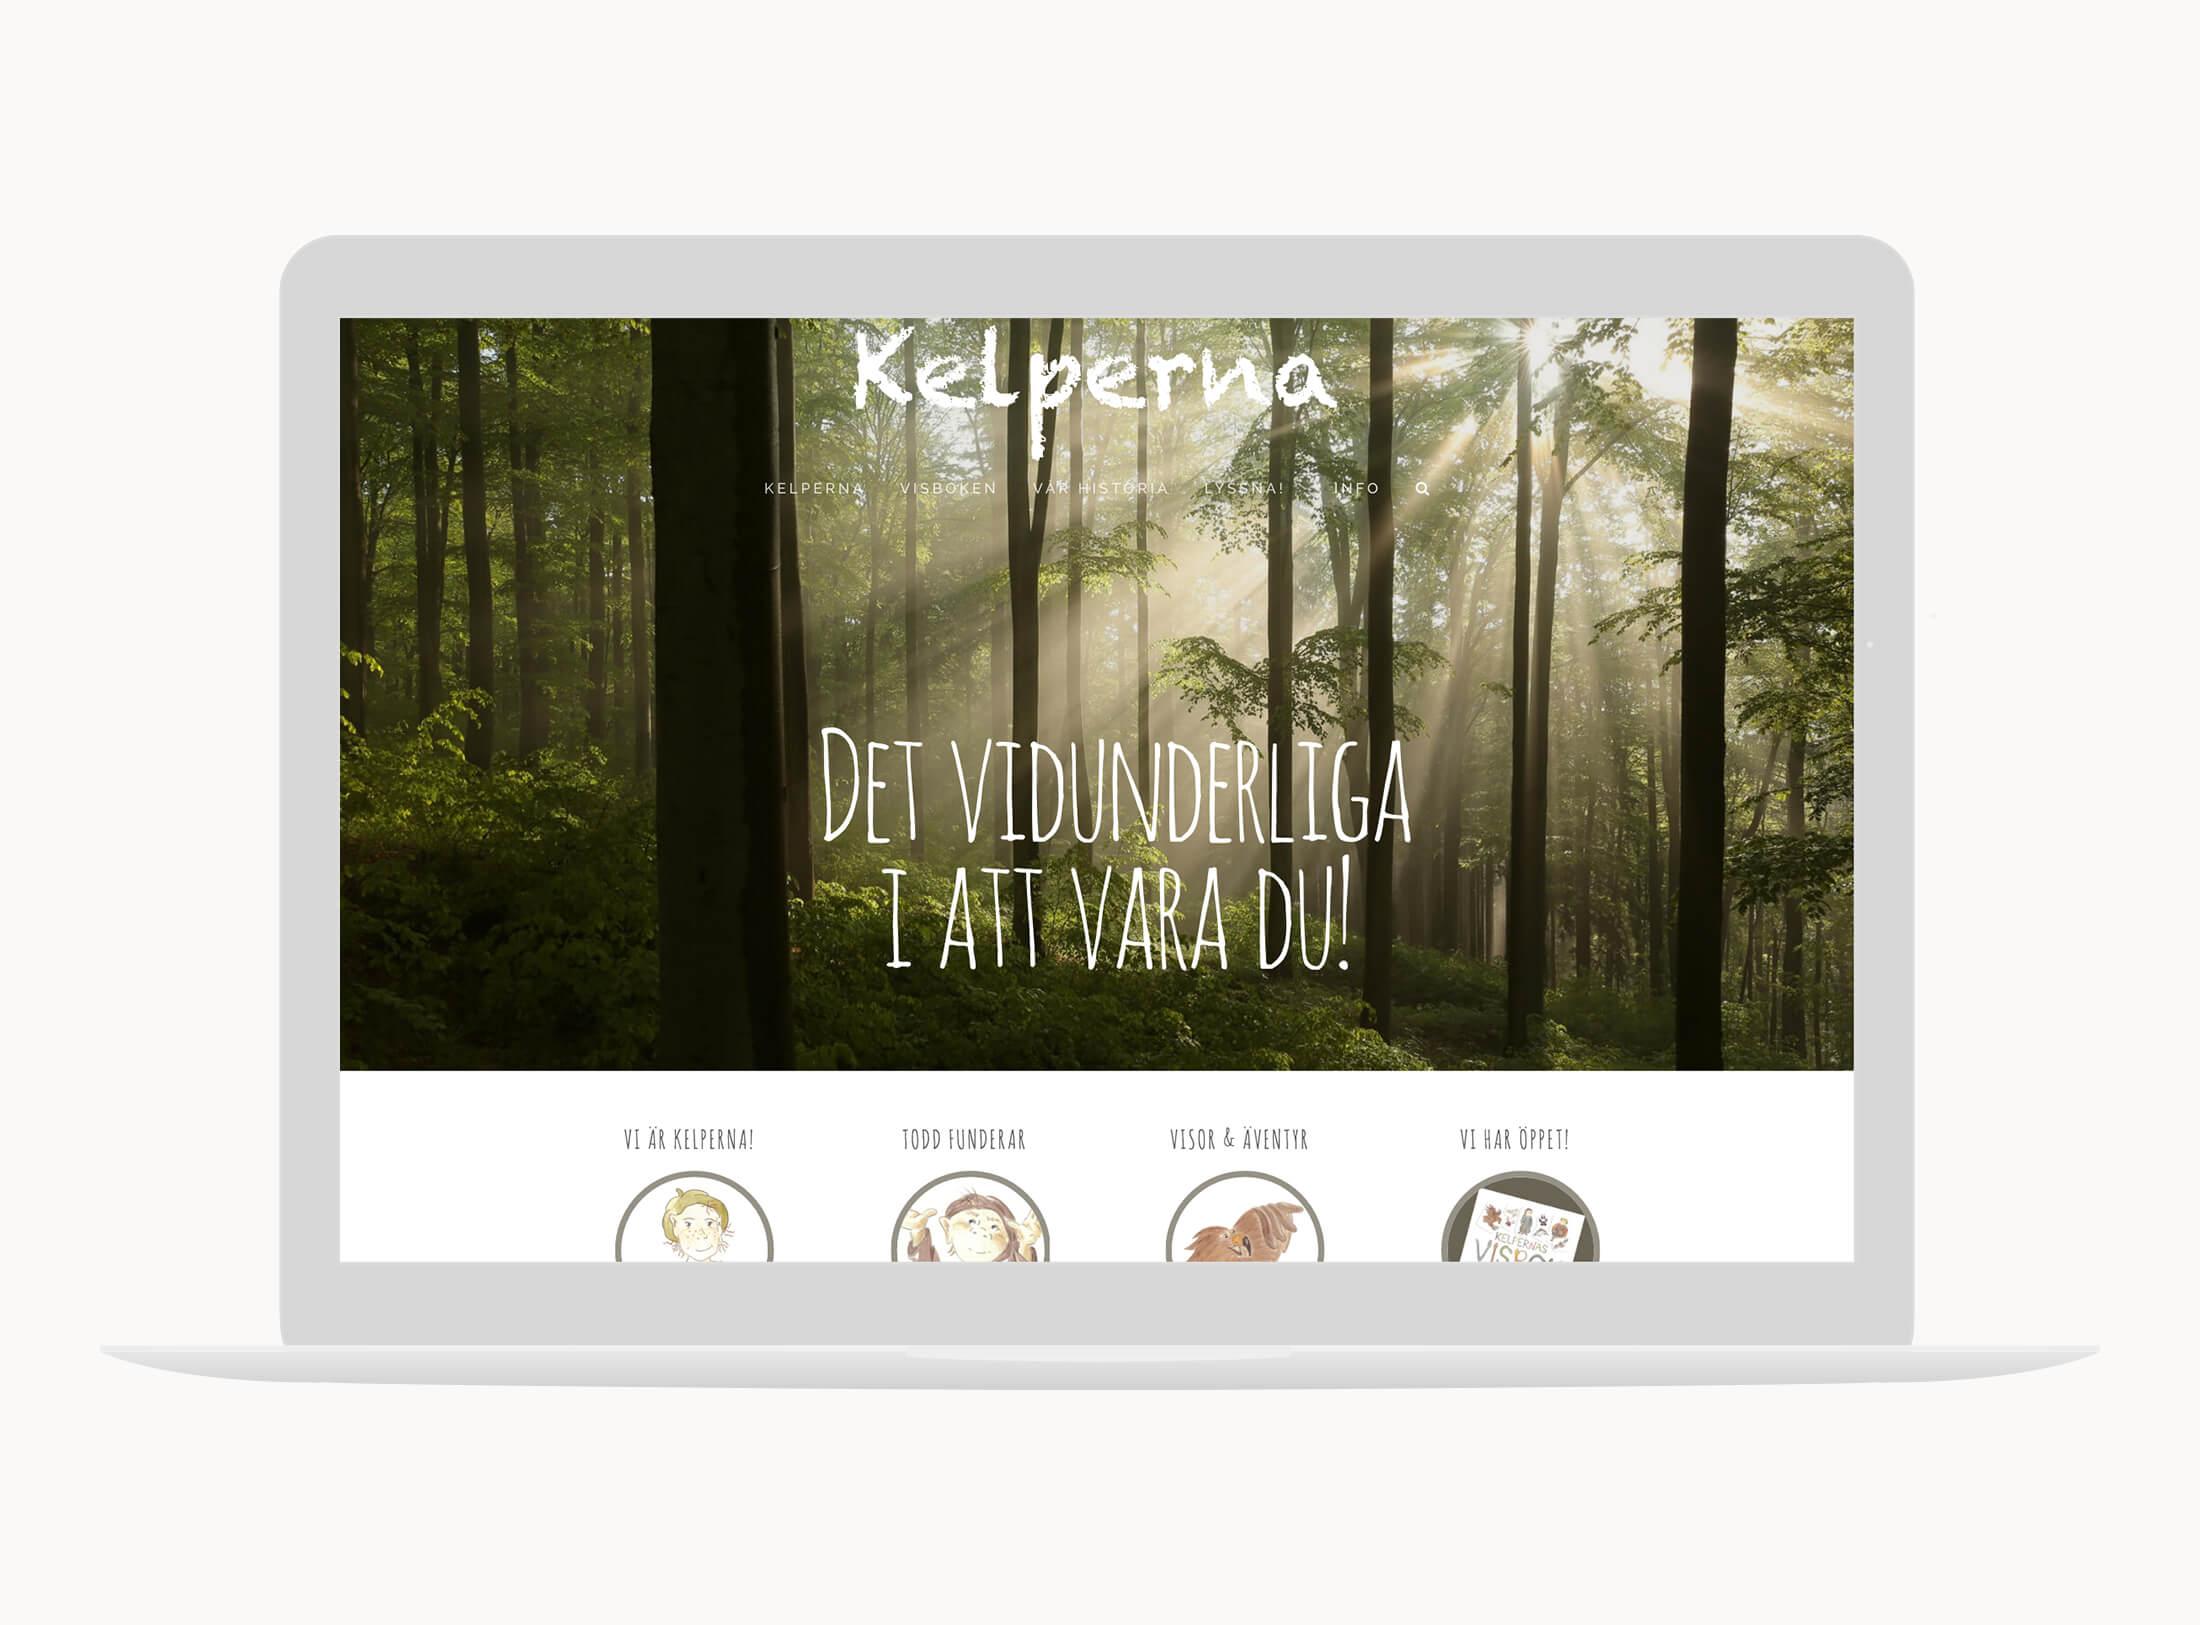 kelperna.se